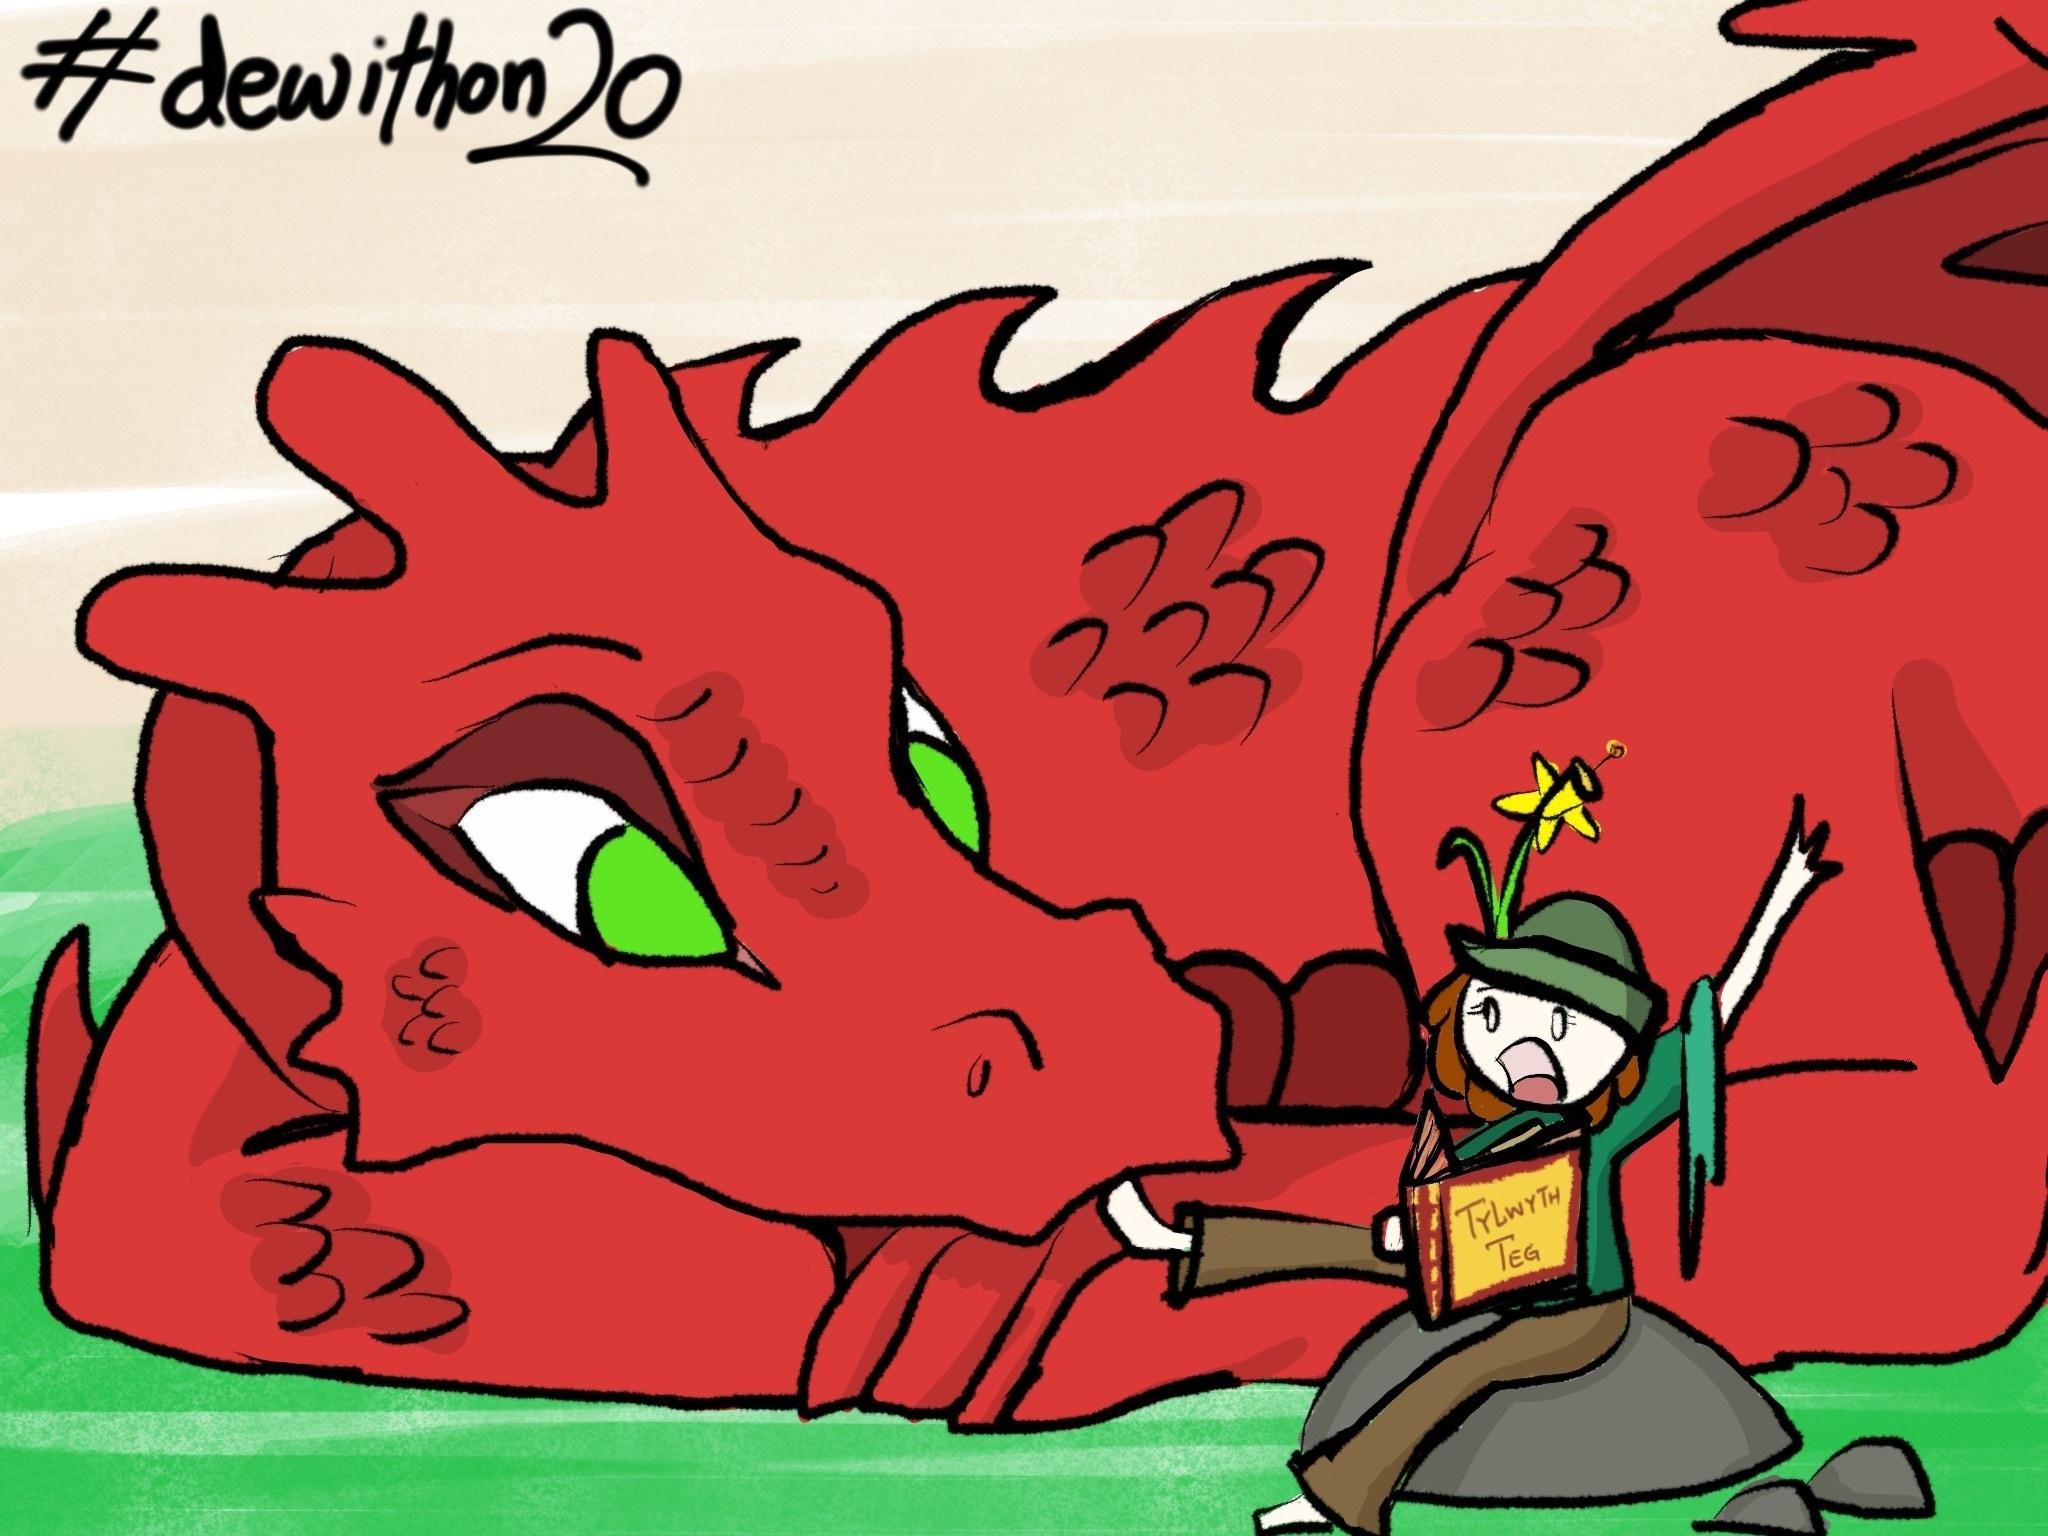 Wales Dragon Readathon Dewithon2020 (2)